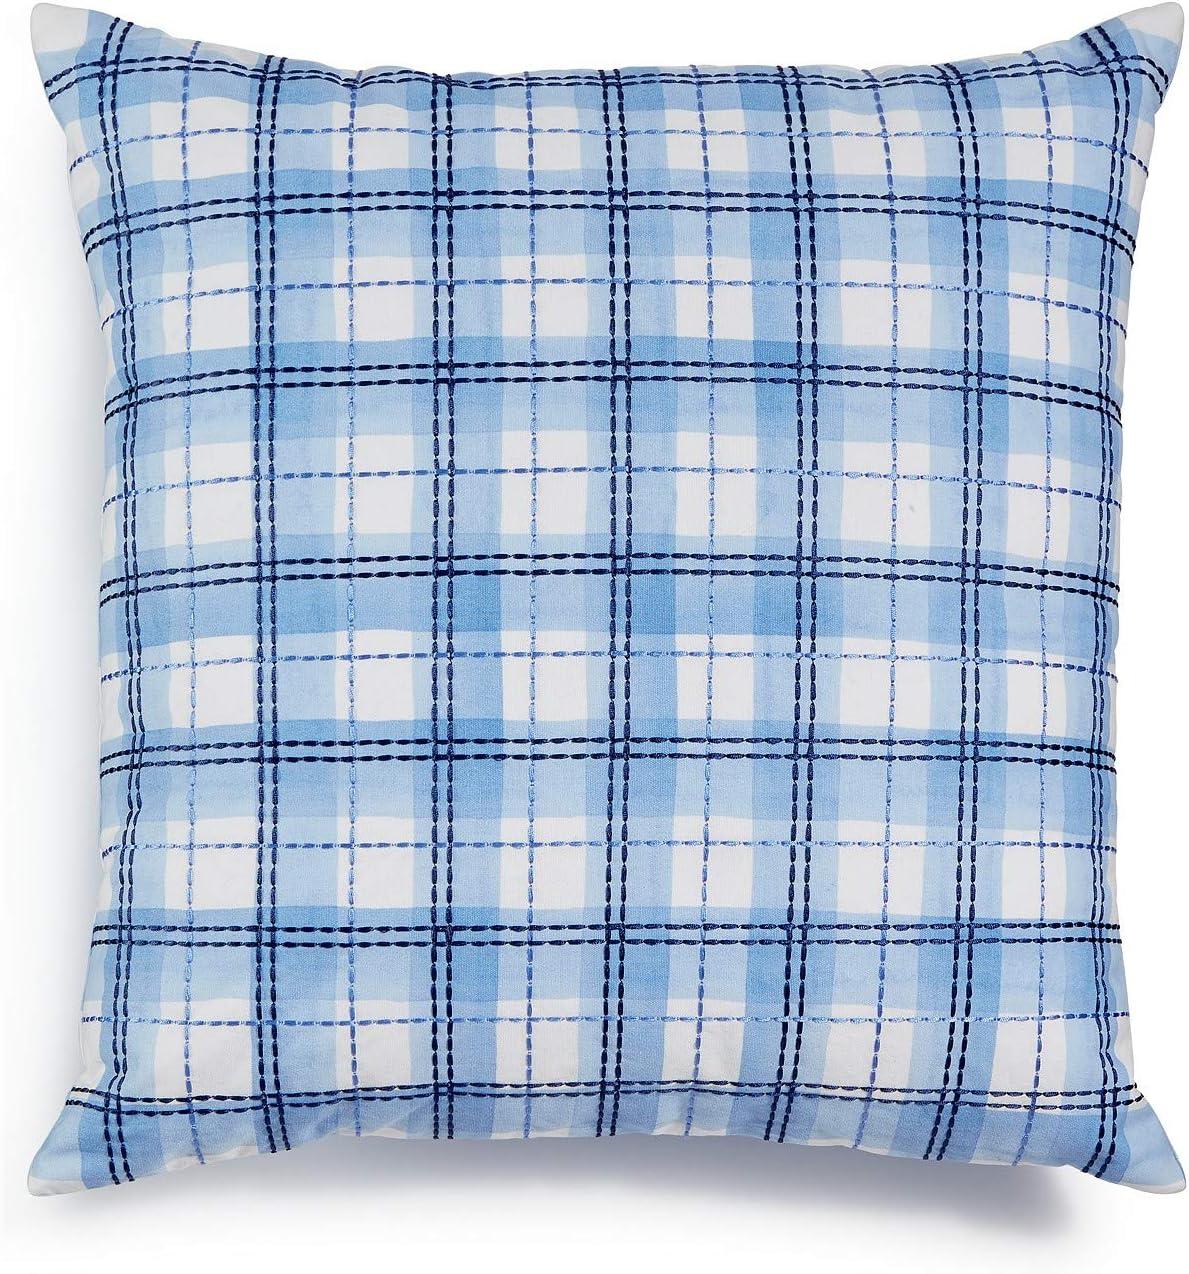 Amazon Com Charter Club Damask Designs Embroidered Blue Plaid 18x18 Decorative Pillow Home Kitchen